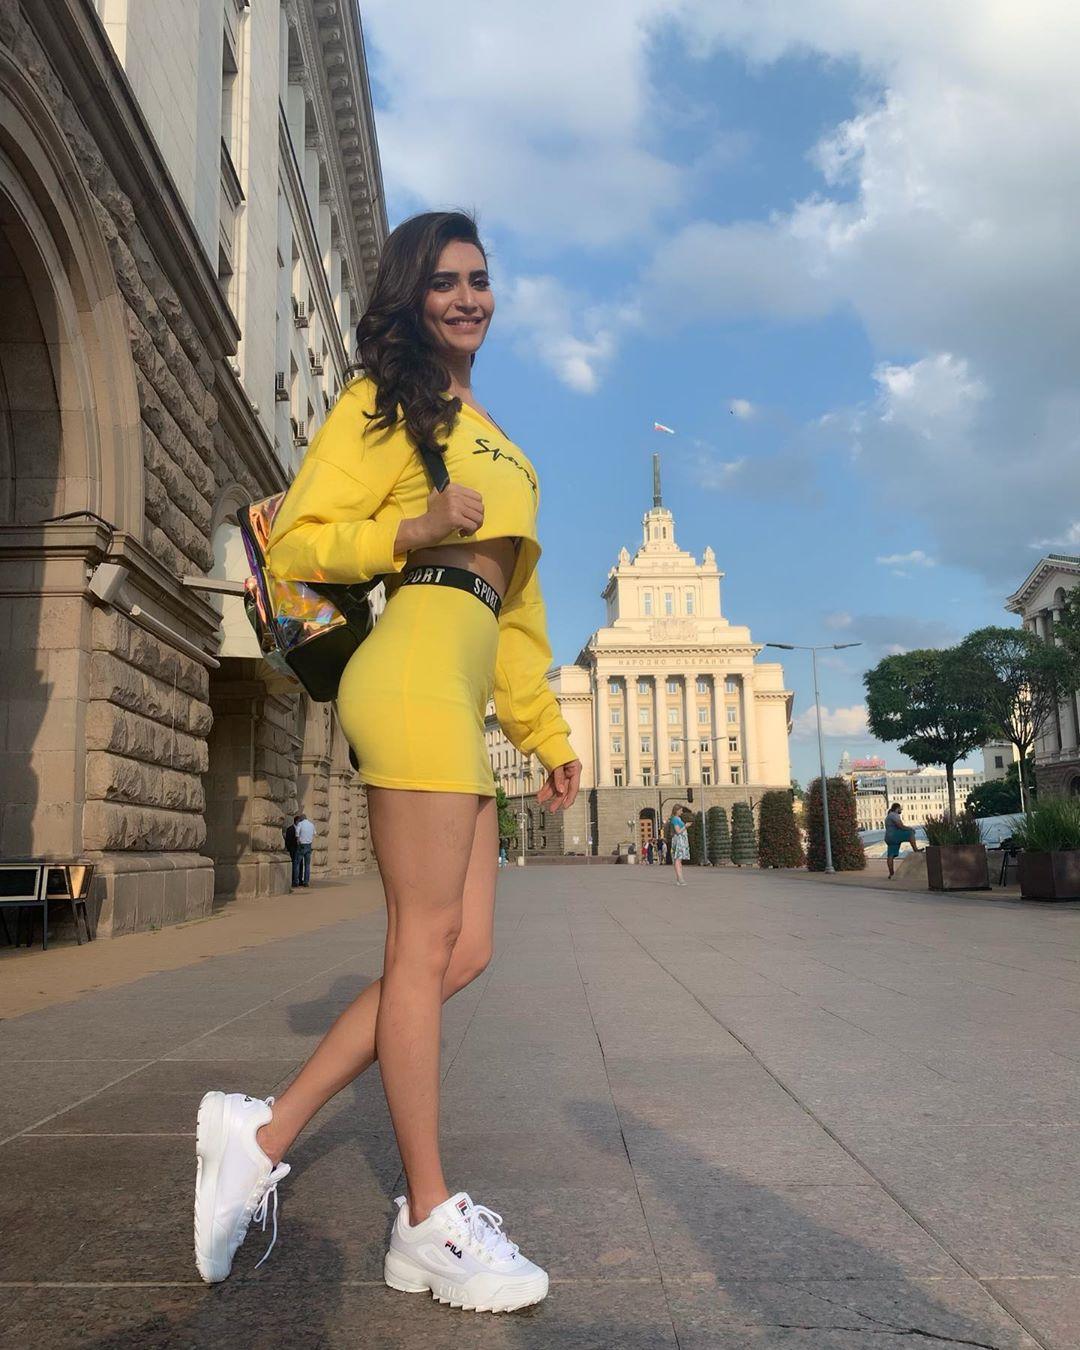 Bollywood Tadka.करिश्मा तन्ना इमेज,करिश्मा तन्ना फोटो,करिश्मा तन्ना पिक्चर,